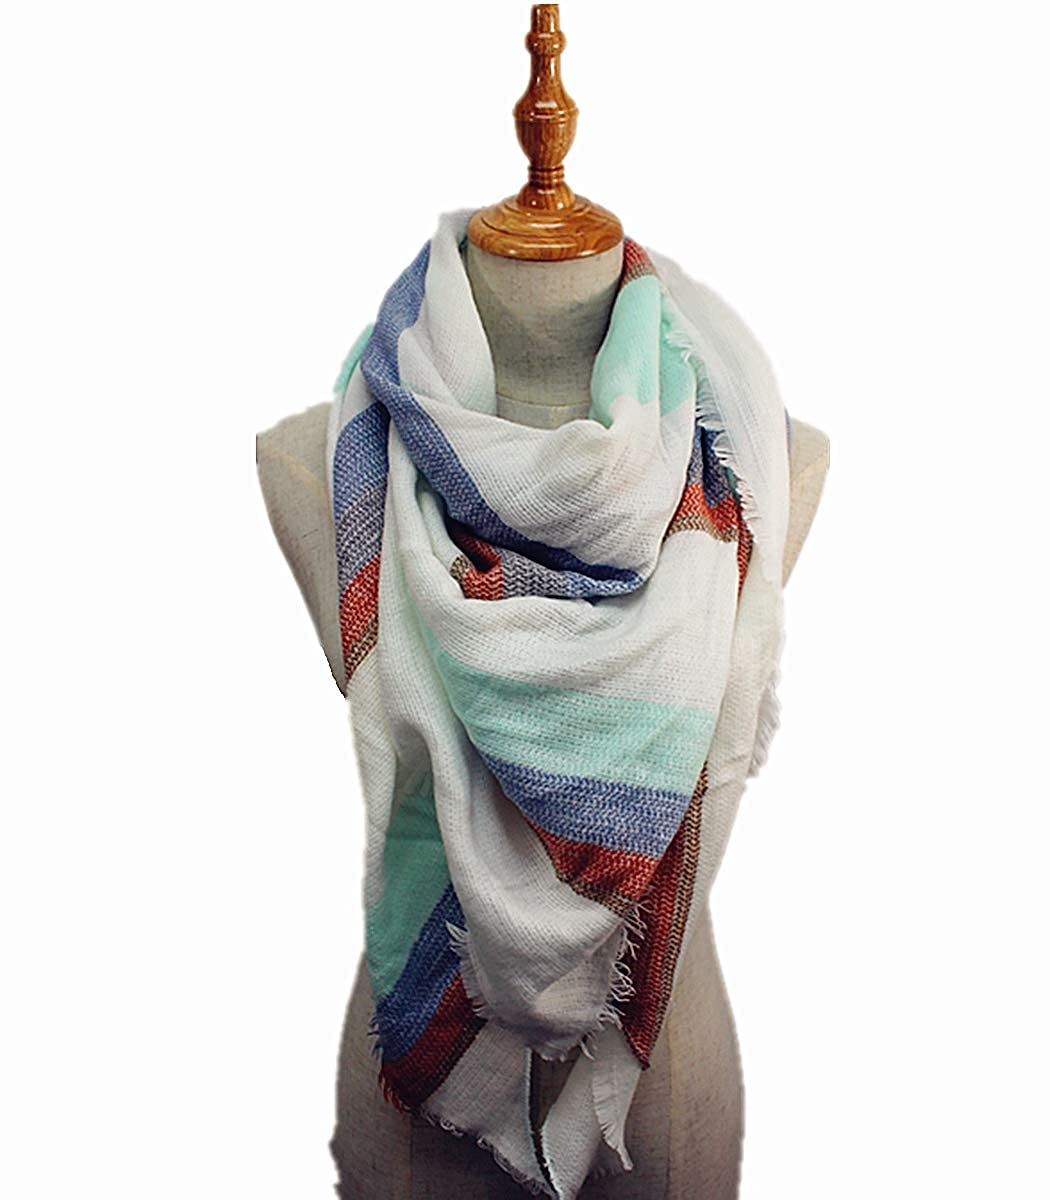 QH-383-17-04 White-Aqua-Brown Plaid Triangle Blanket Scarf